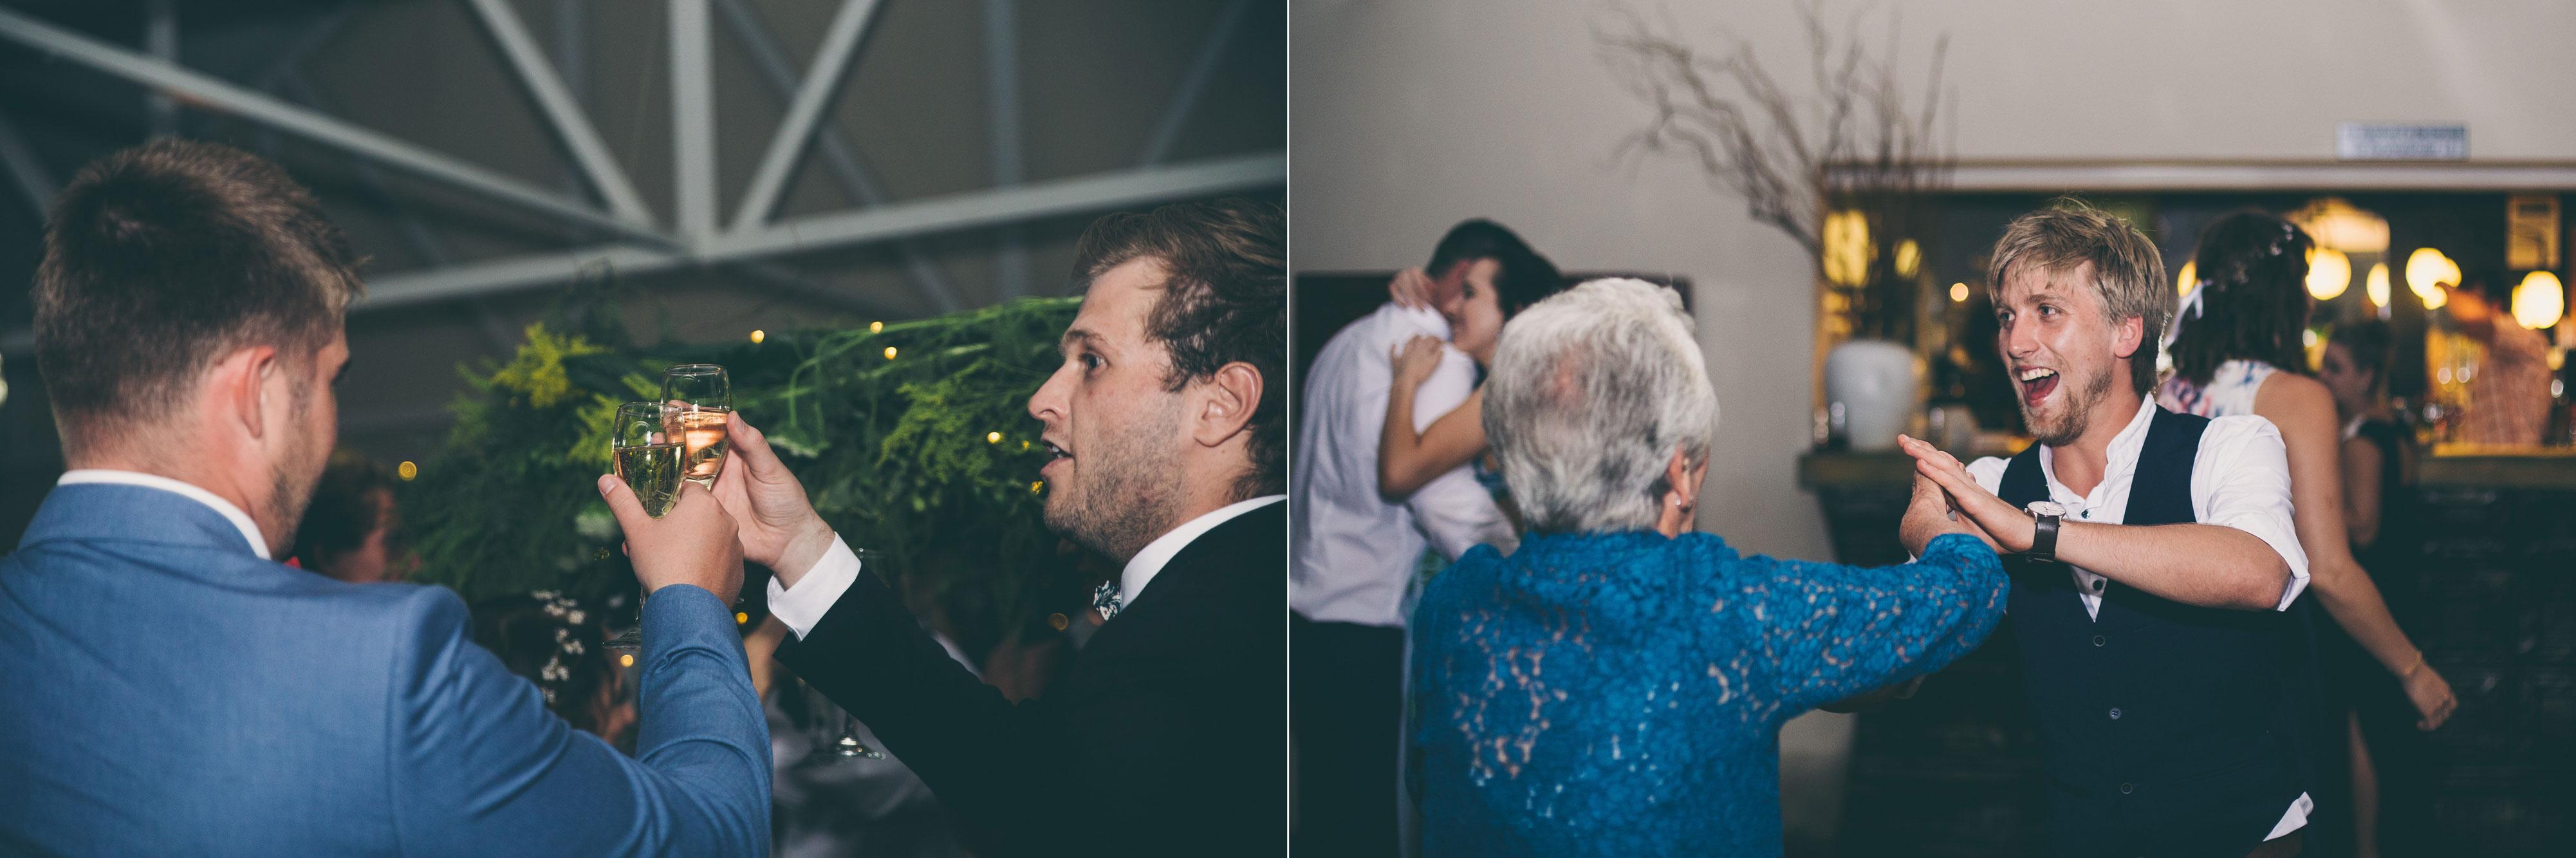 The Nutcracker_Wedding Photography_Maryke Albertyn 51